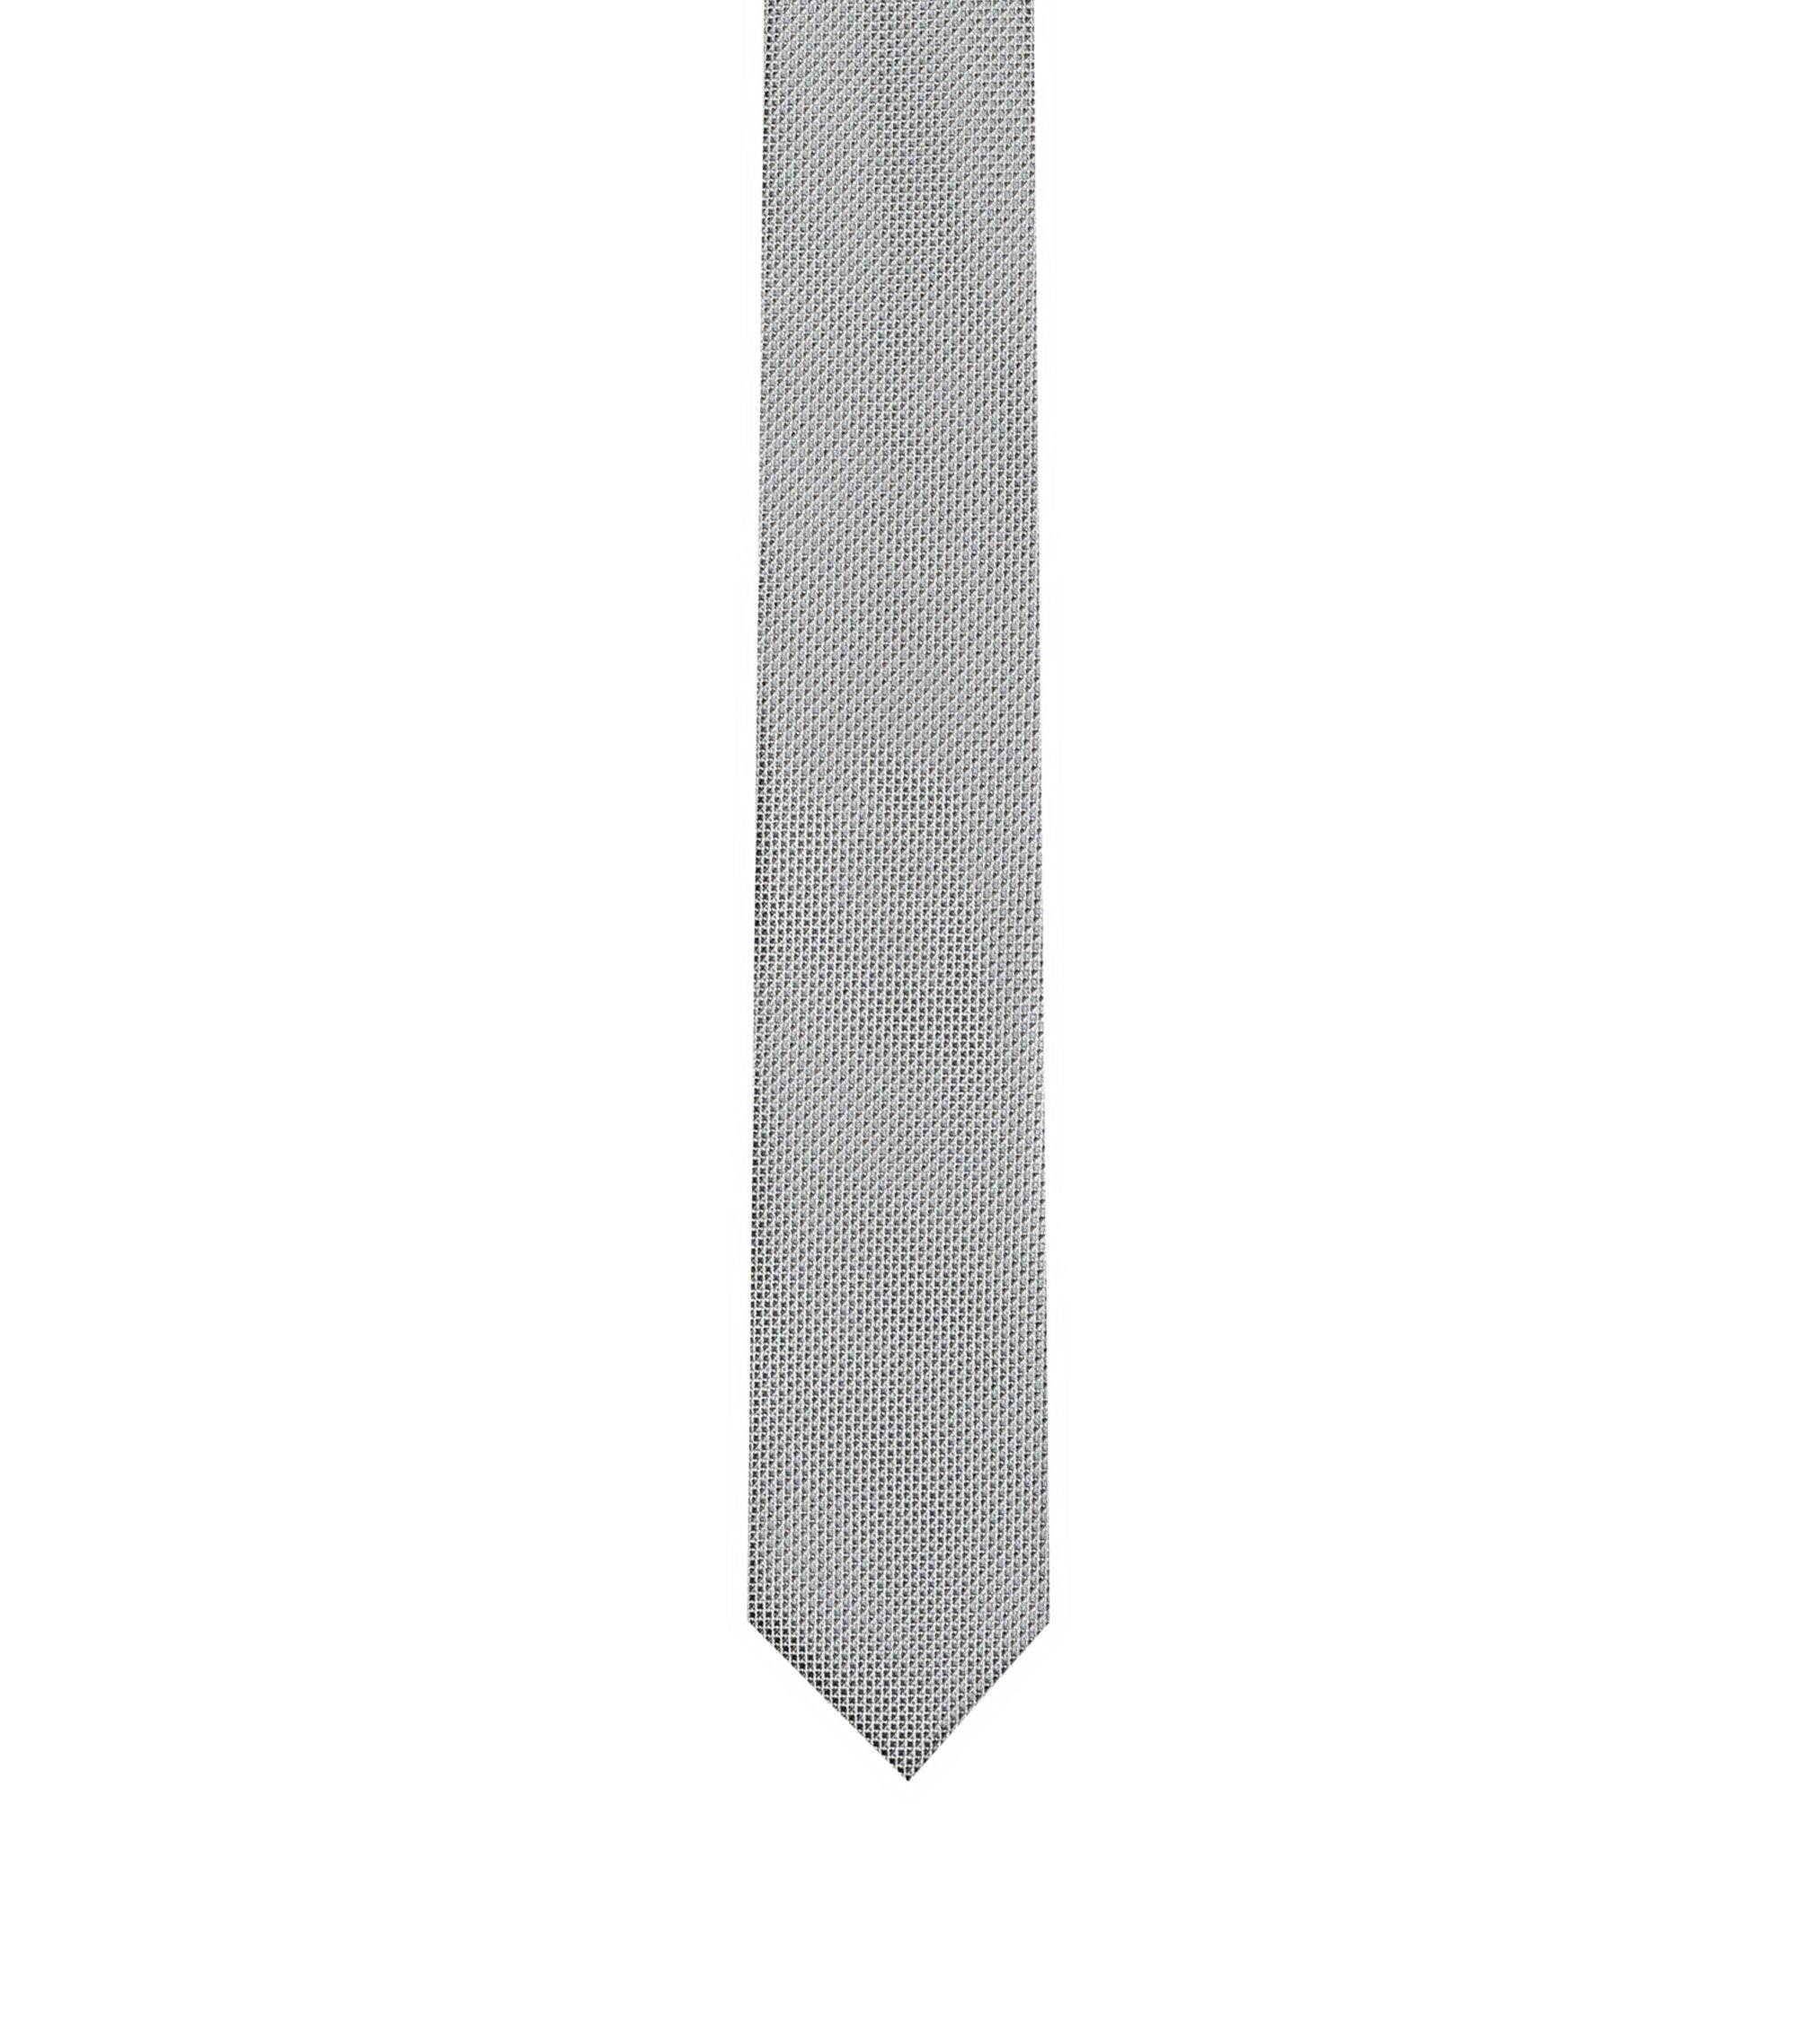 Gemusterte Krawatte aus Seiden-Jacquard, Grau